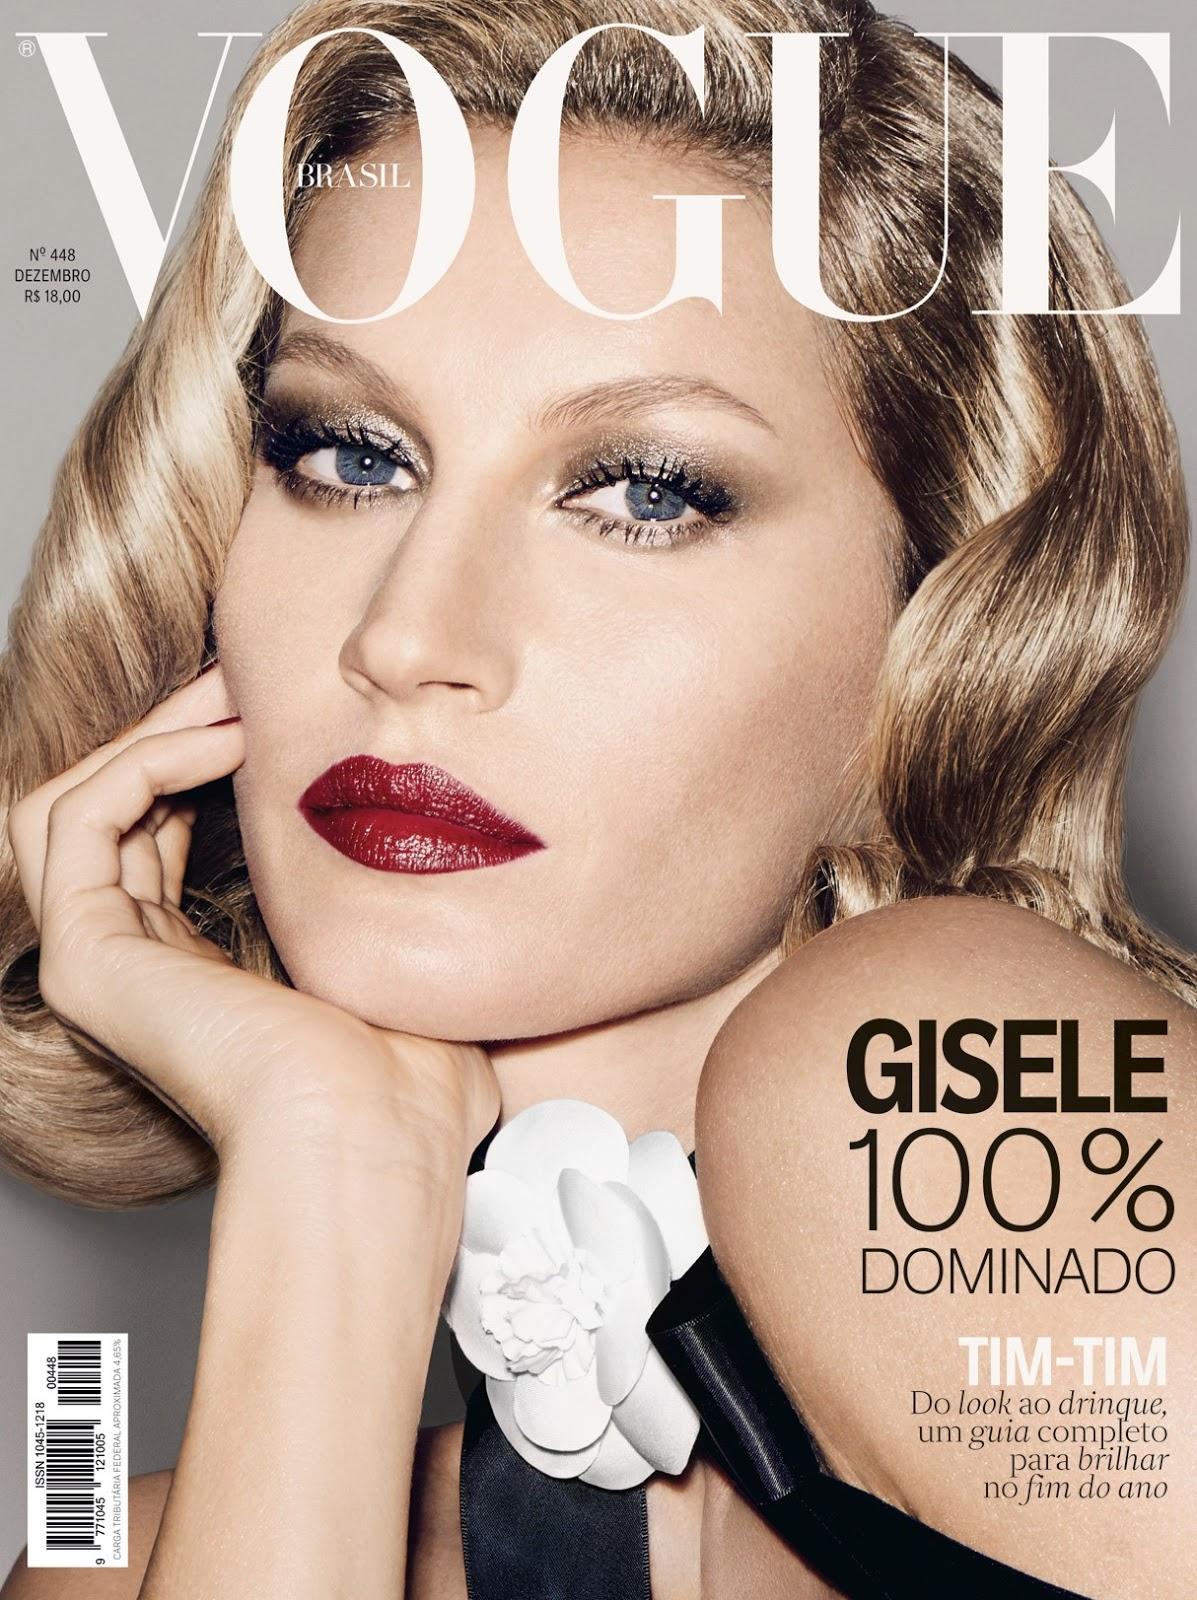 Larissa Brito  Gisele Bundchen  Capa da Vogue Brasil de dezembro 8f8c867854